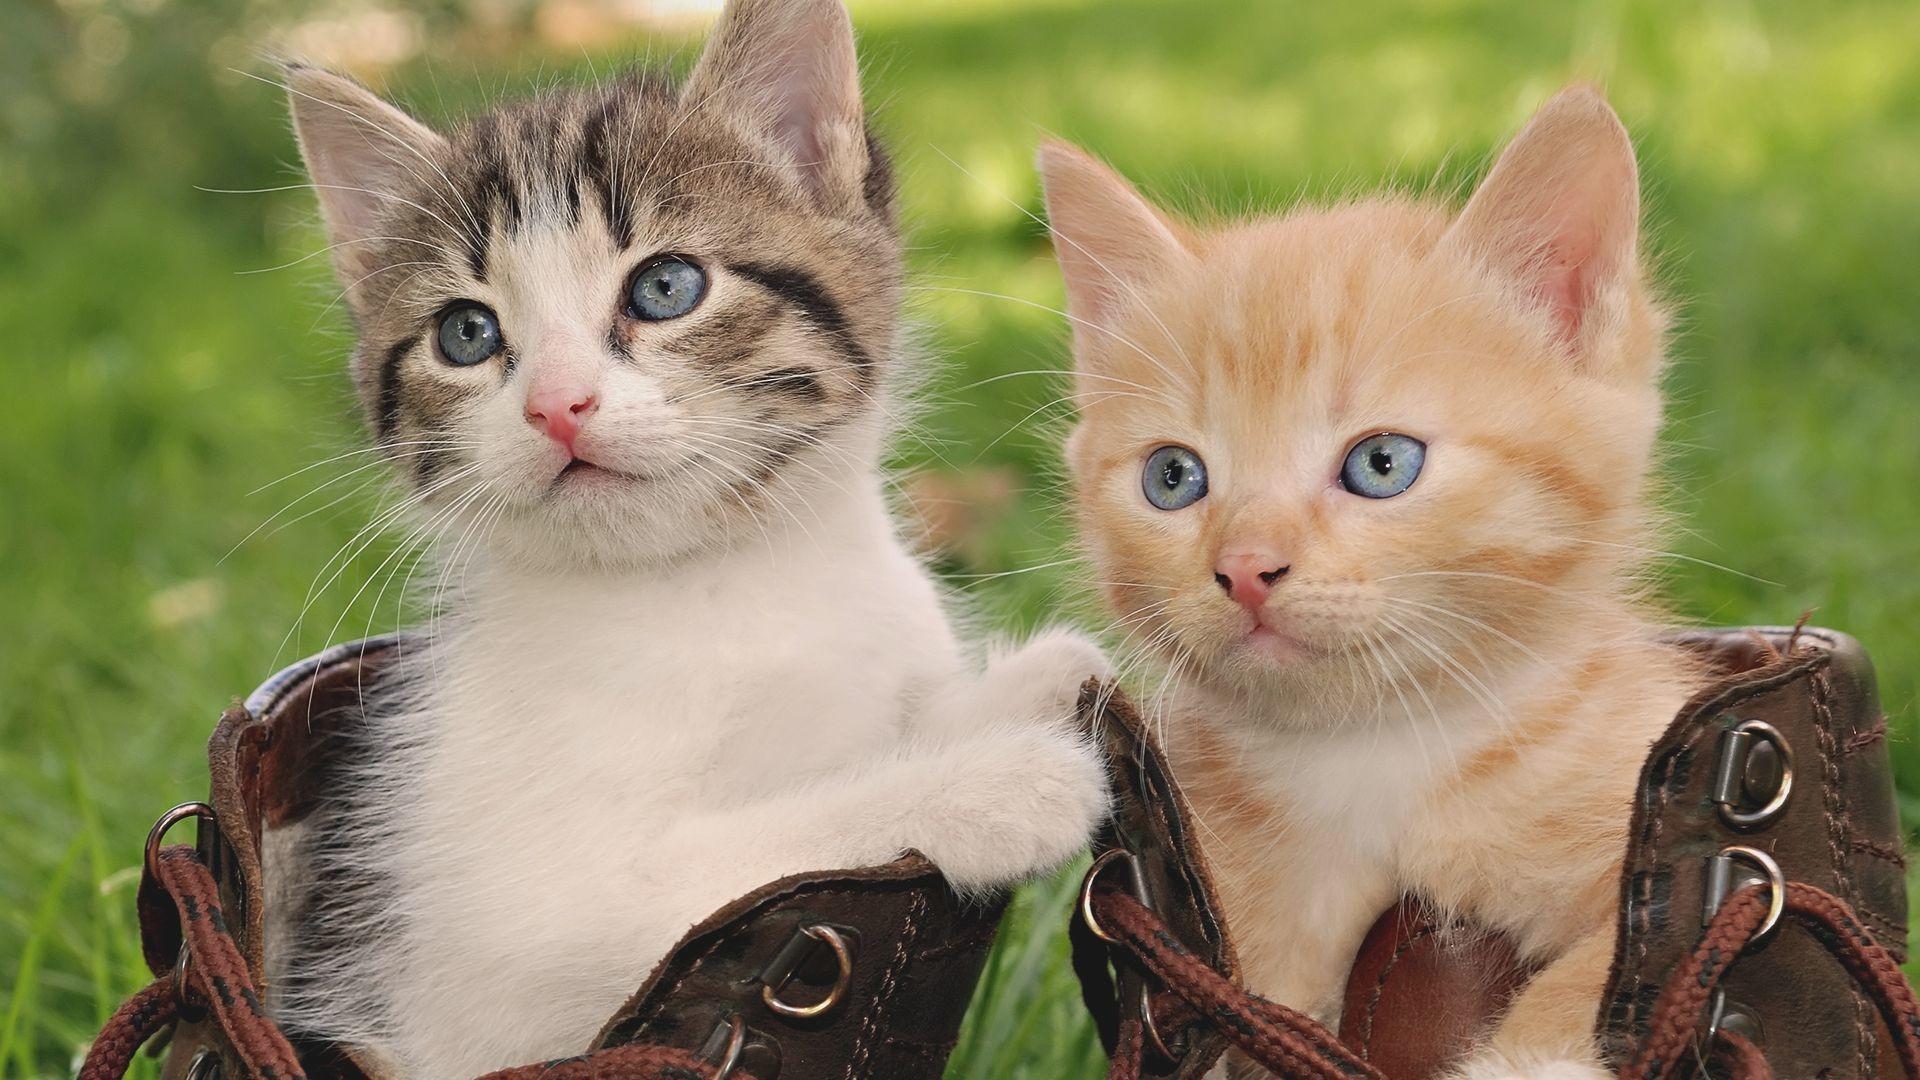 Cute Baby Cats Wallpaper HD Resolution : Animal Wallpaper .